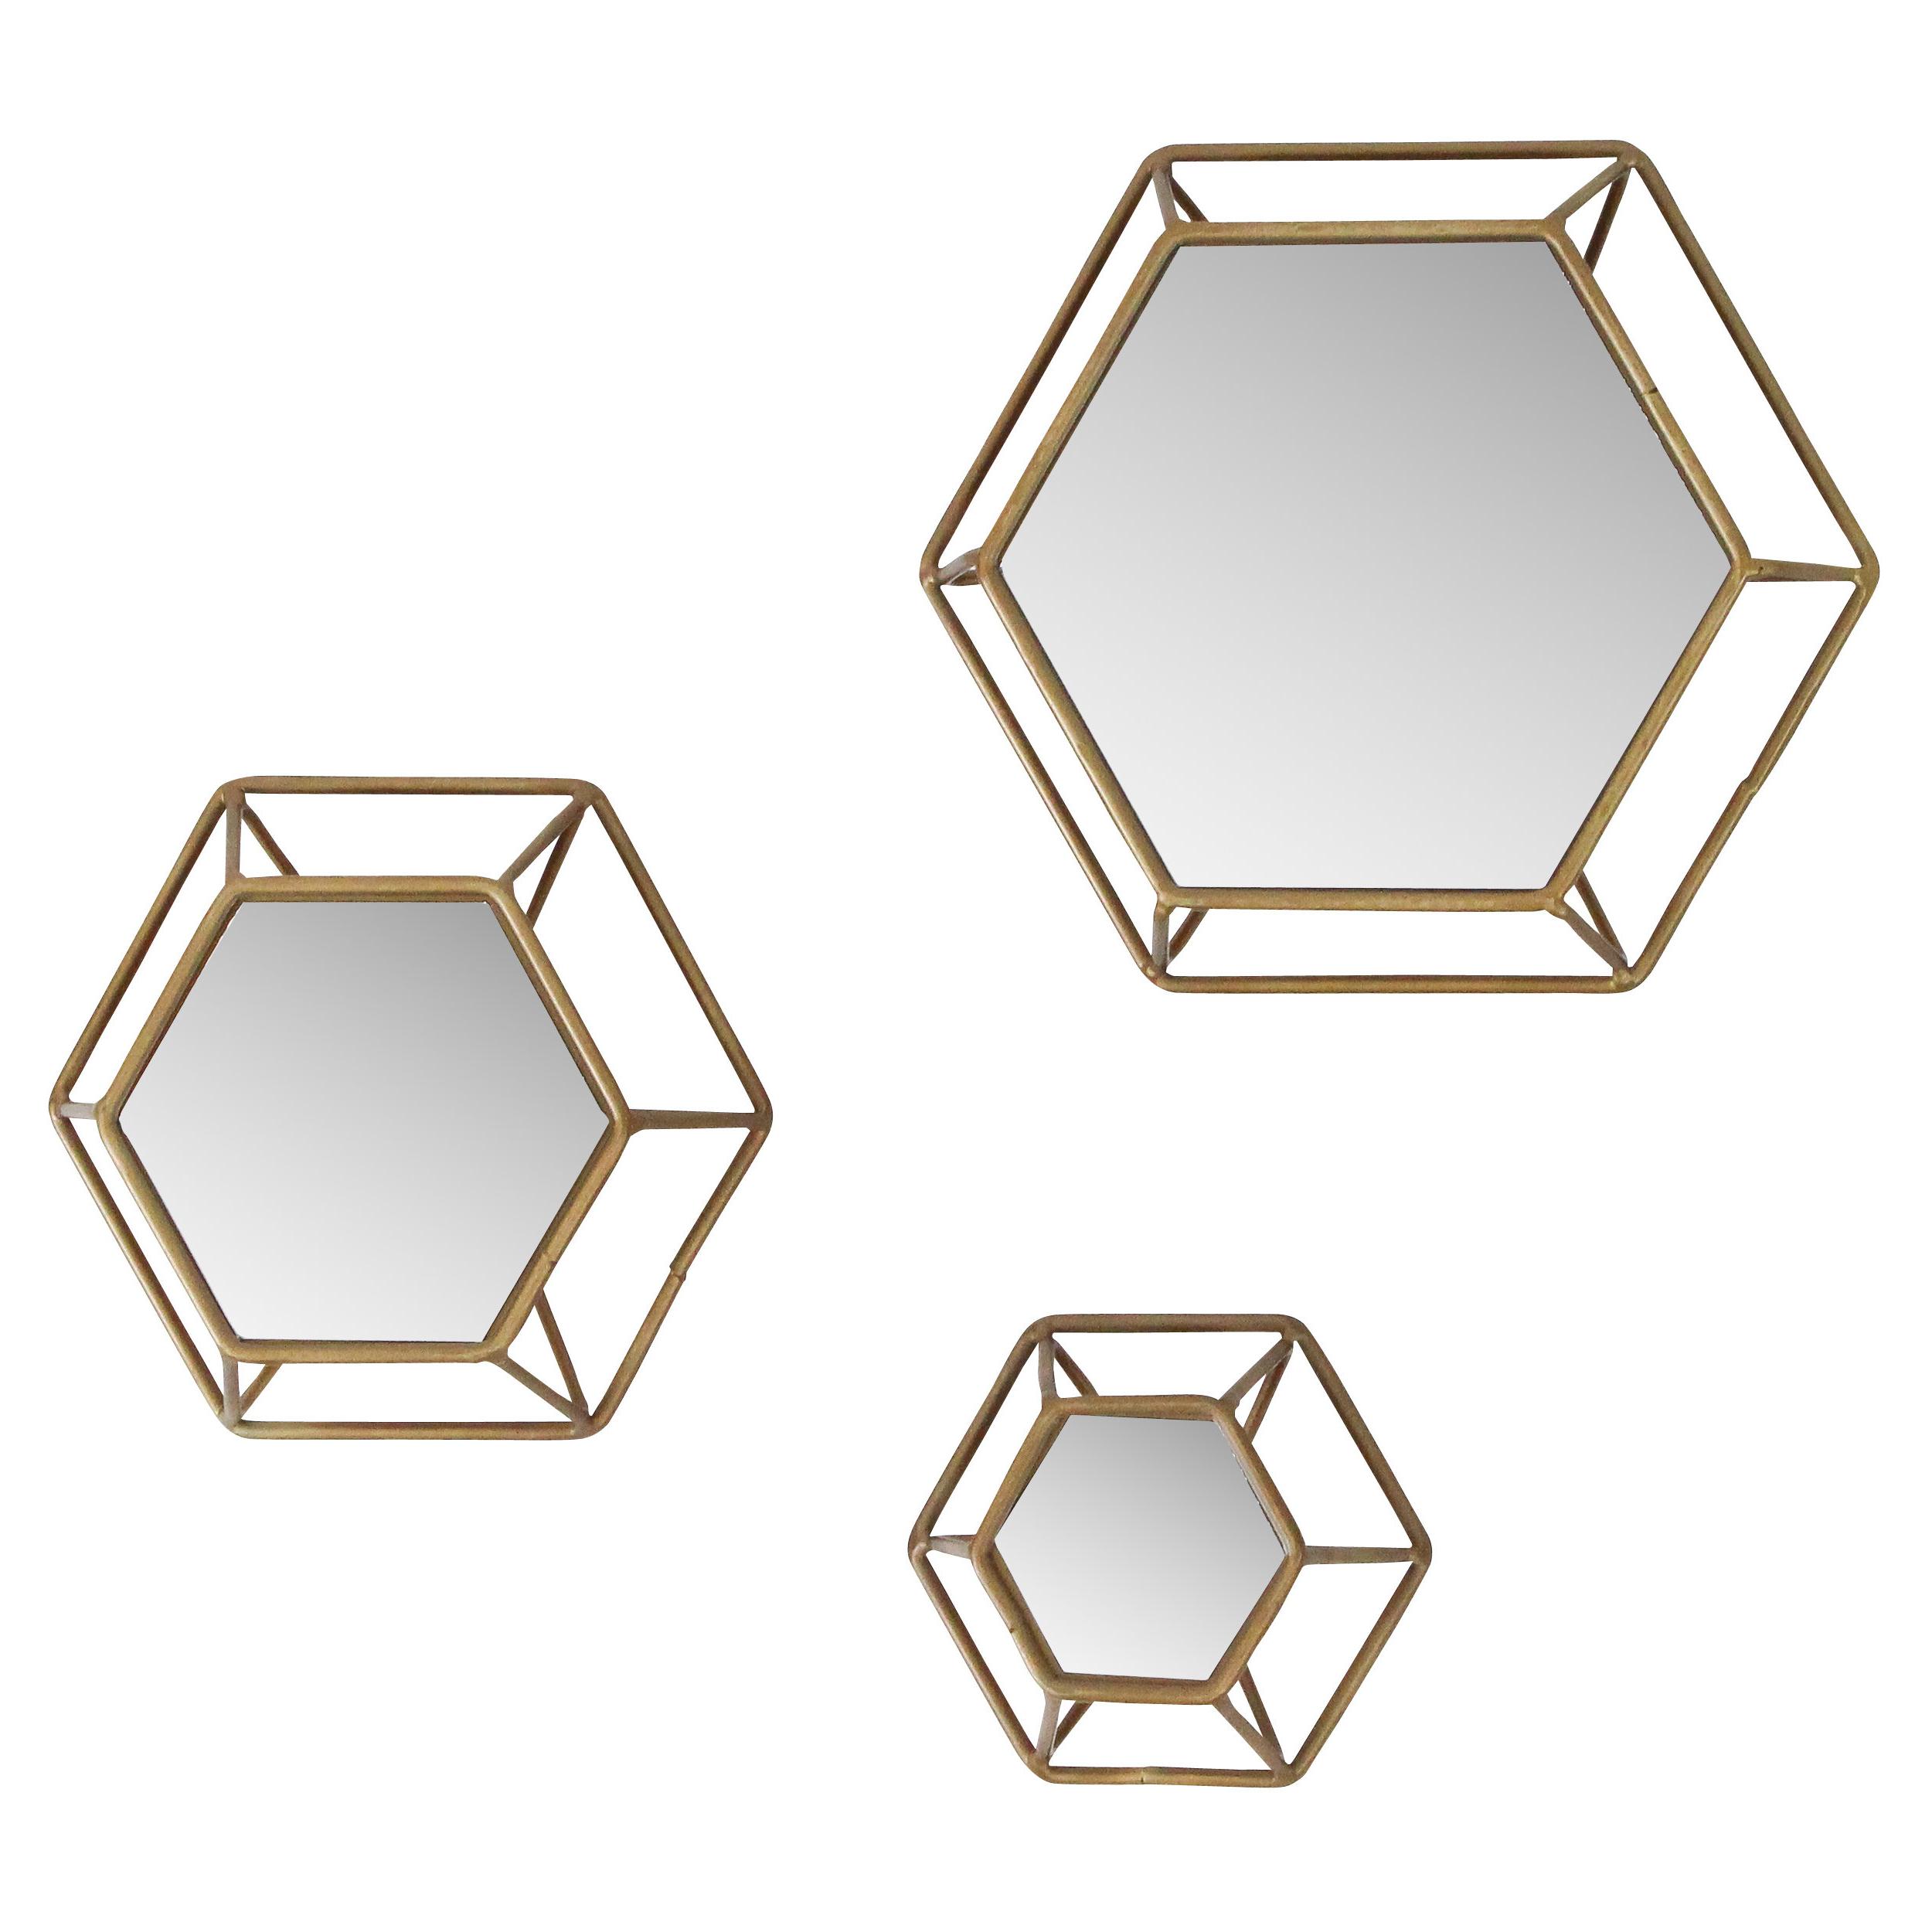 Trendy Yahoue 3 Piece Hexagonal Wall Mirror Set Throughout Gia Hexagon Accent Mirrors (View 7 of 20)